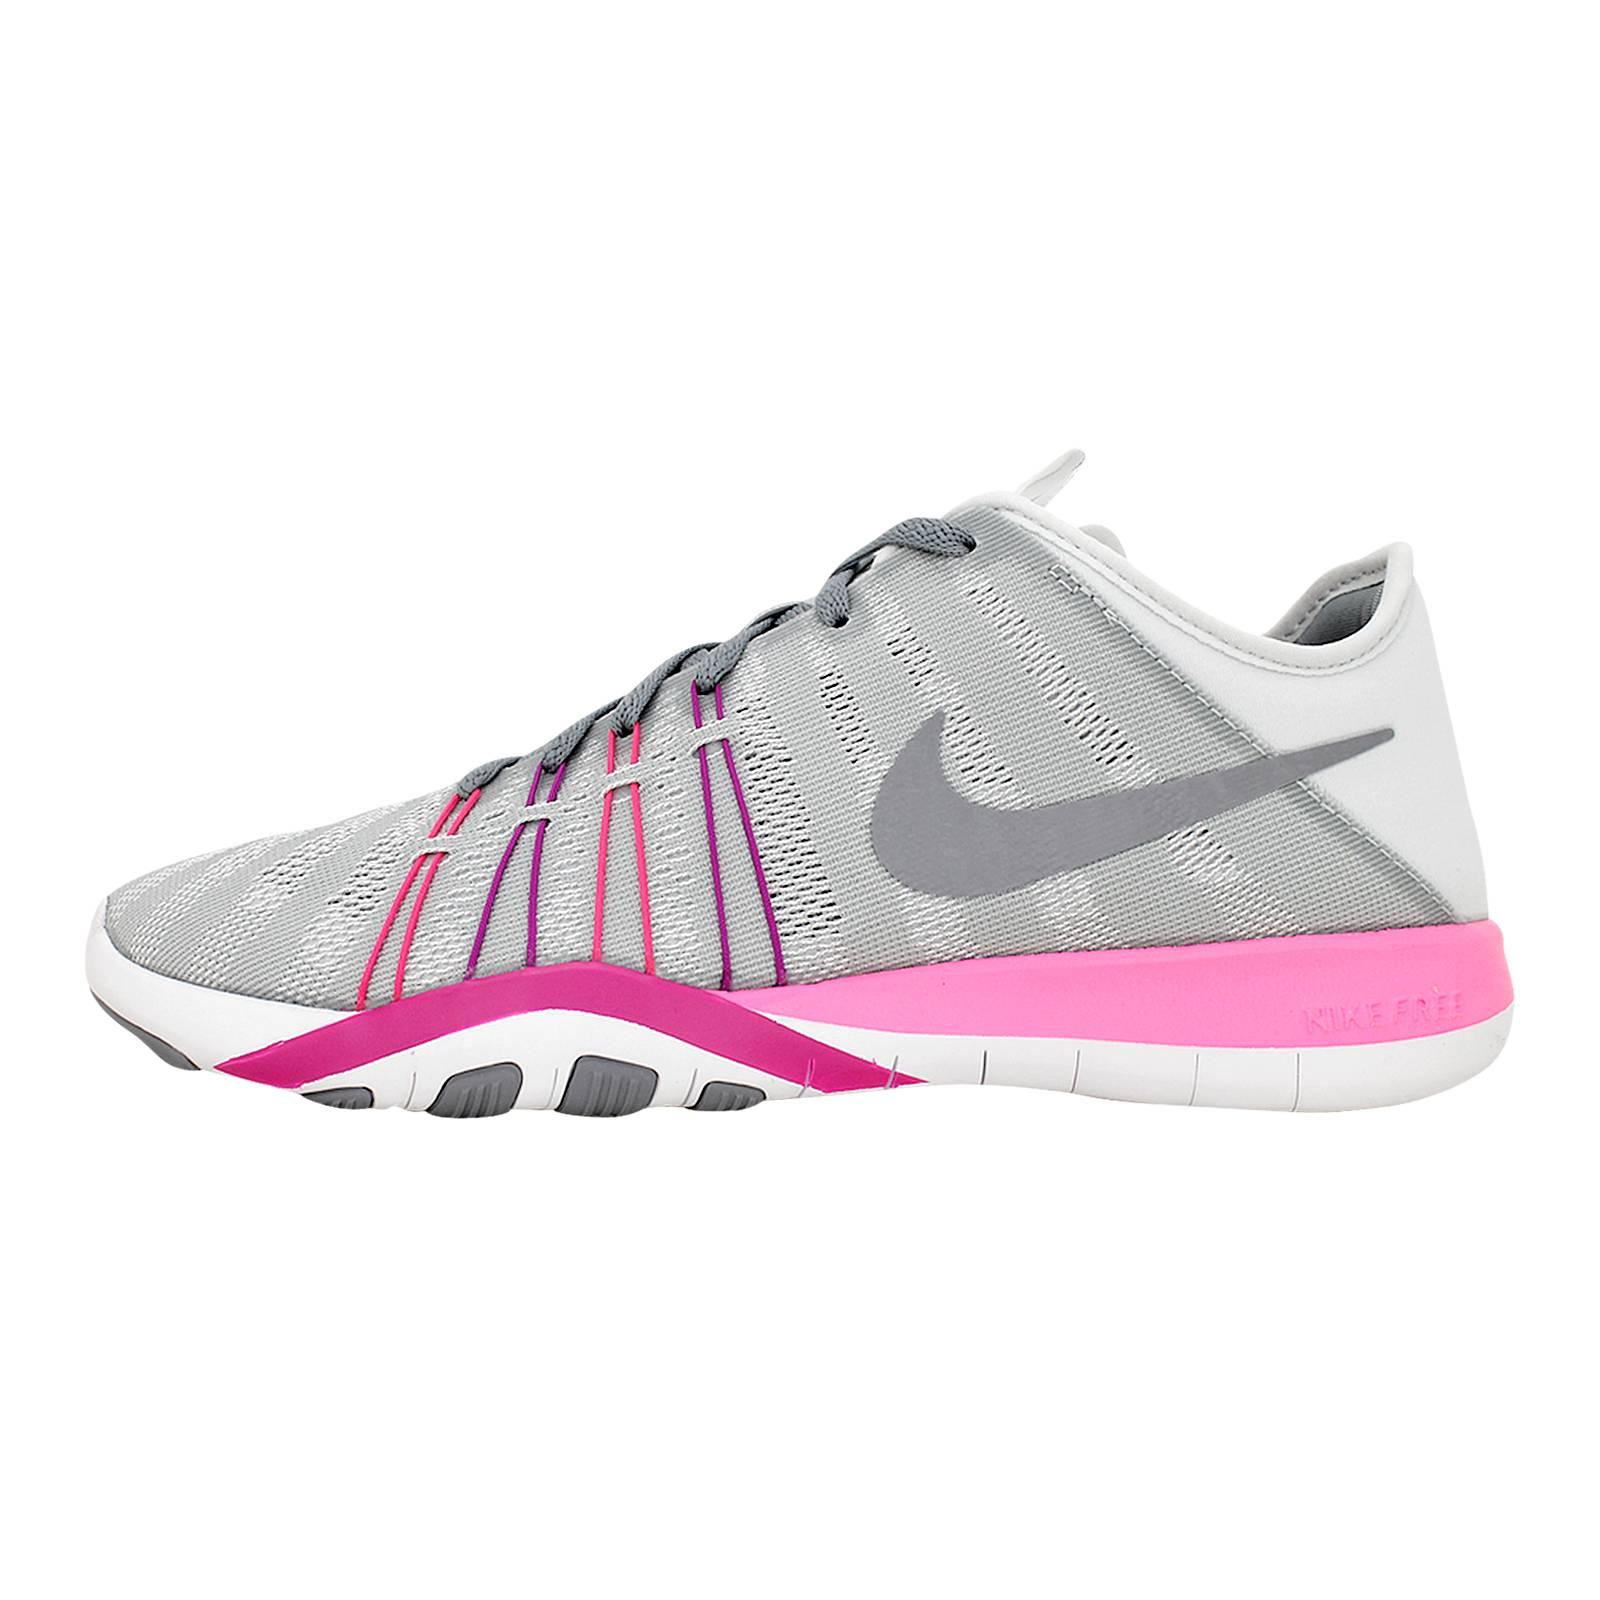 Free TR 6 - Nike Women s athletic shoes made of fabric - Gianna Kazakou  Online e96bd36b2